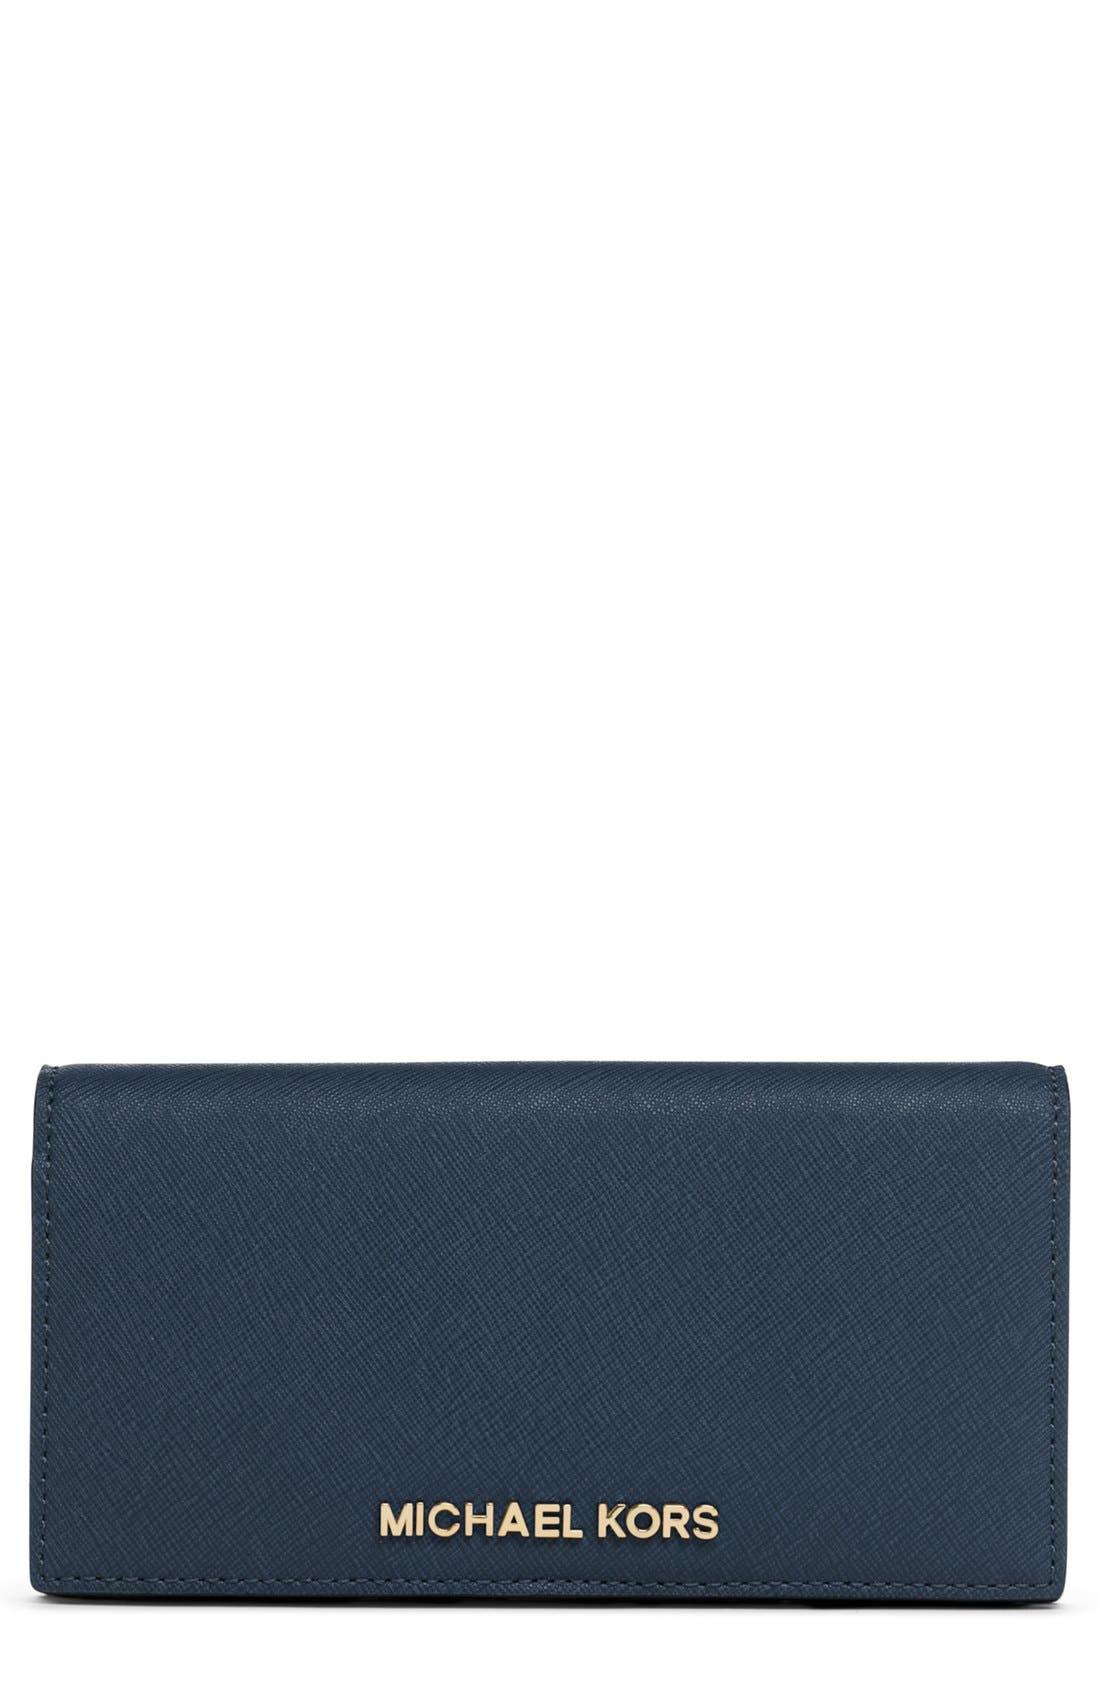 Alternate Image 1 Selected - MICHAEL Michael Kors 'Jet Set - Slim' Saffiano Leather Wallet